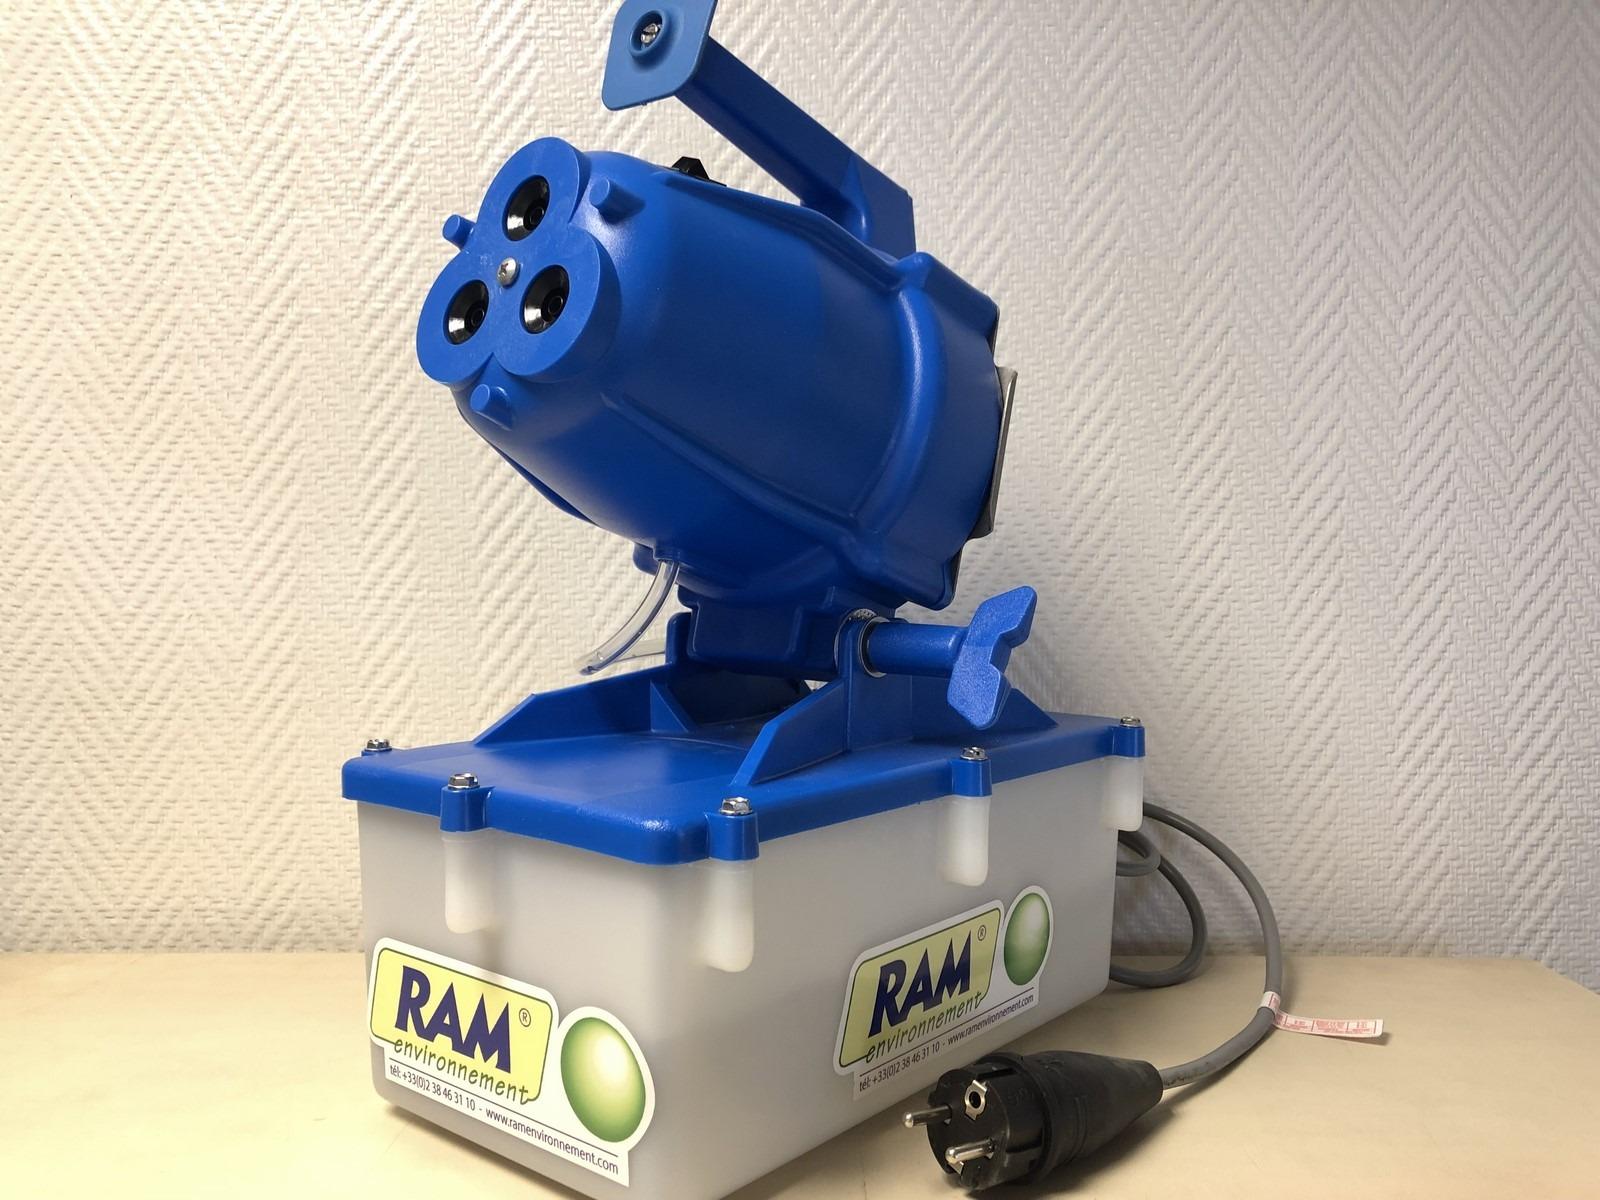 canon de brumisation portatif portable autonome turboram TRD5